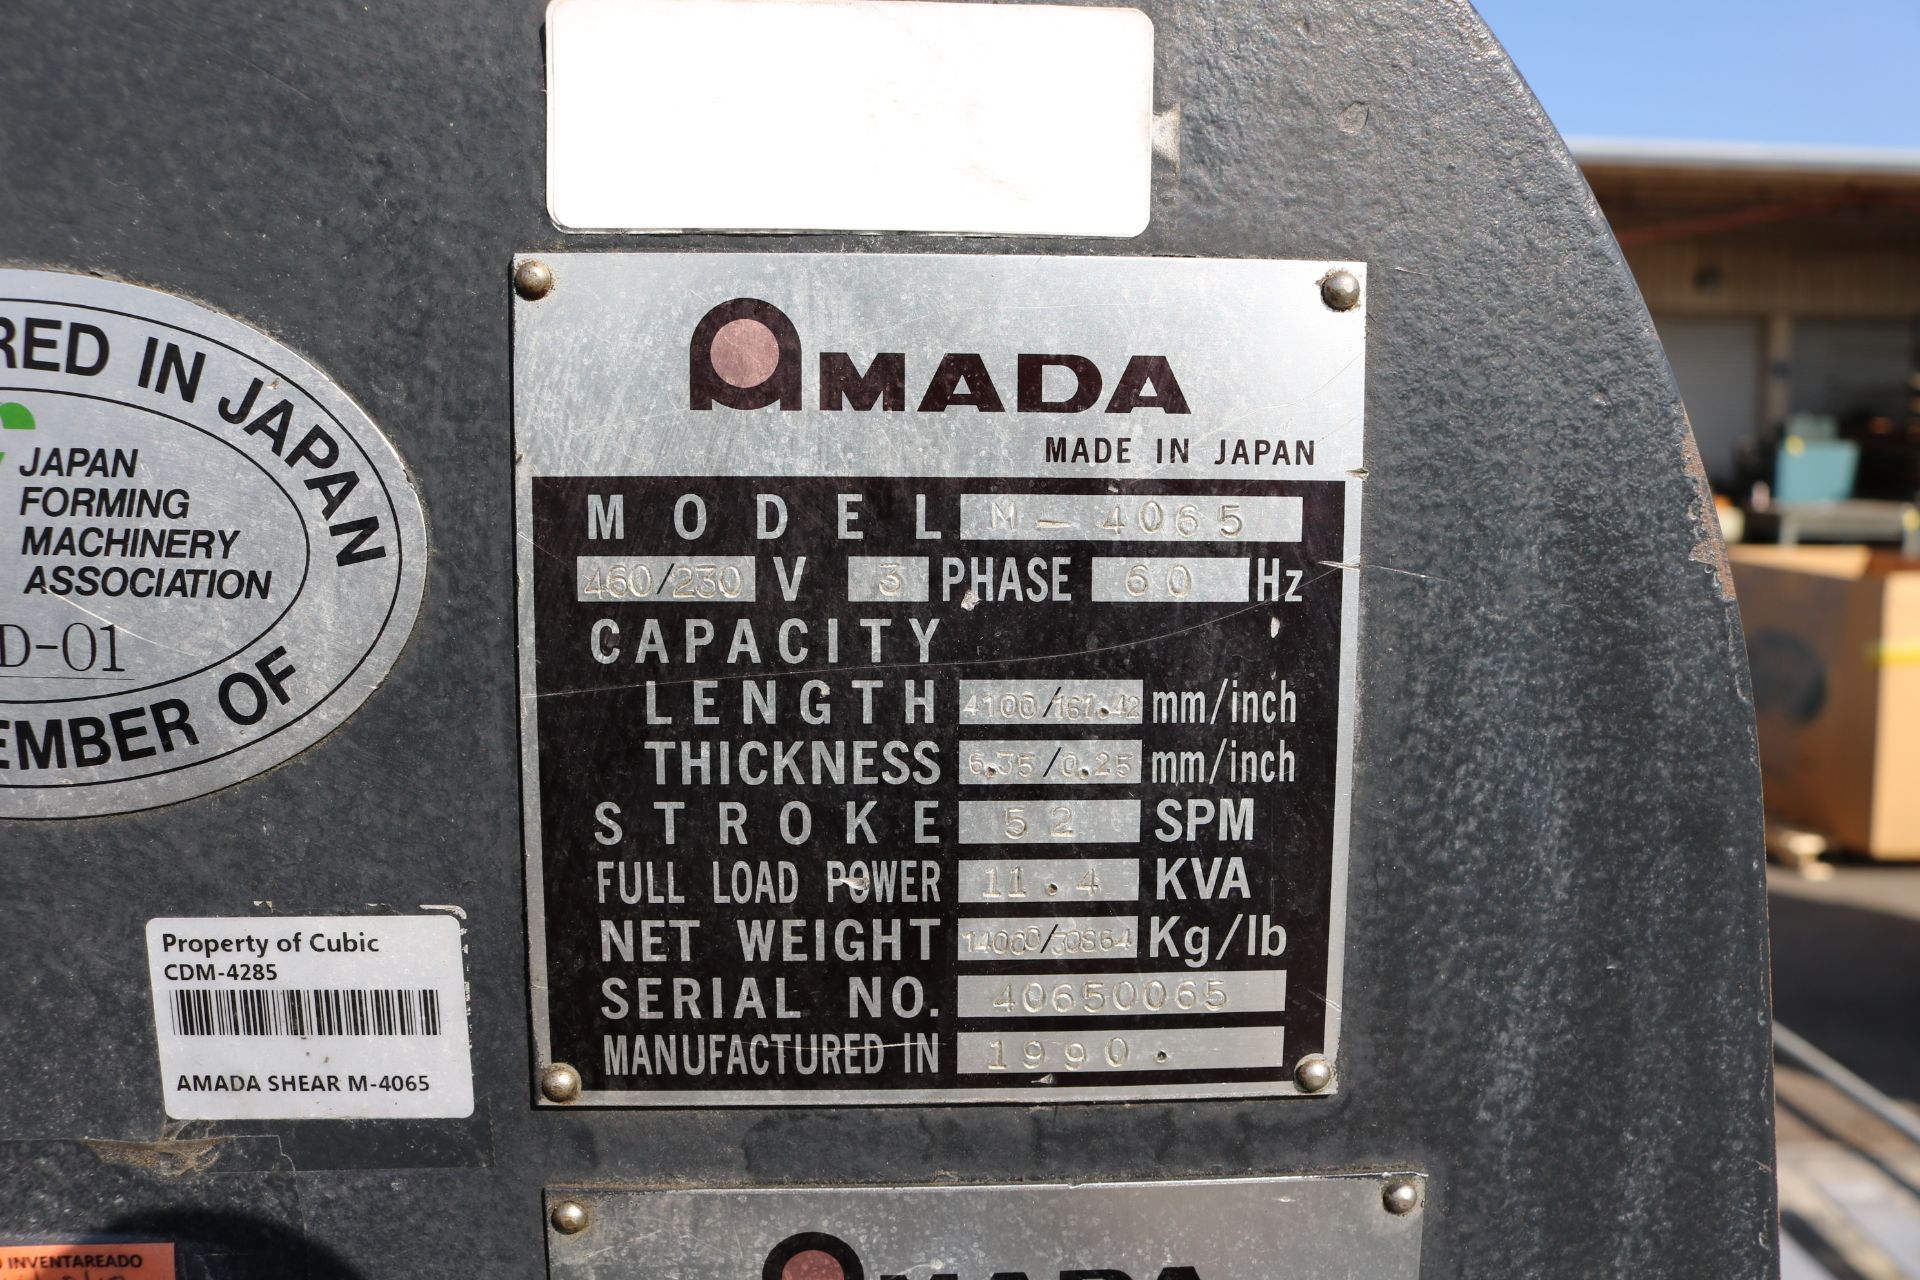 "Lot 10 - 1990 AMADA M-4065 SHEAR, 161.42"" X .25"" CAPACITY, MECHANICAL, AMADA CONTROL, 52 SPM, RIGHT HAND"